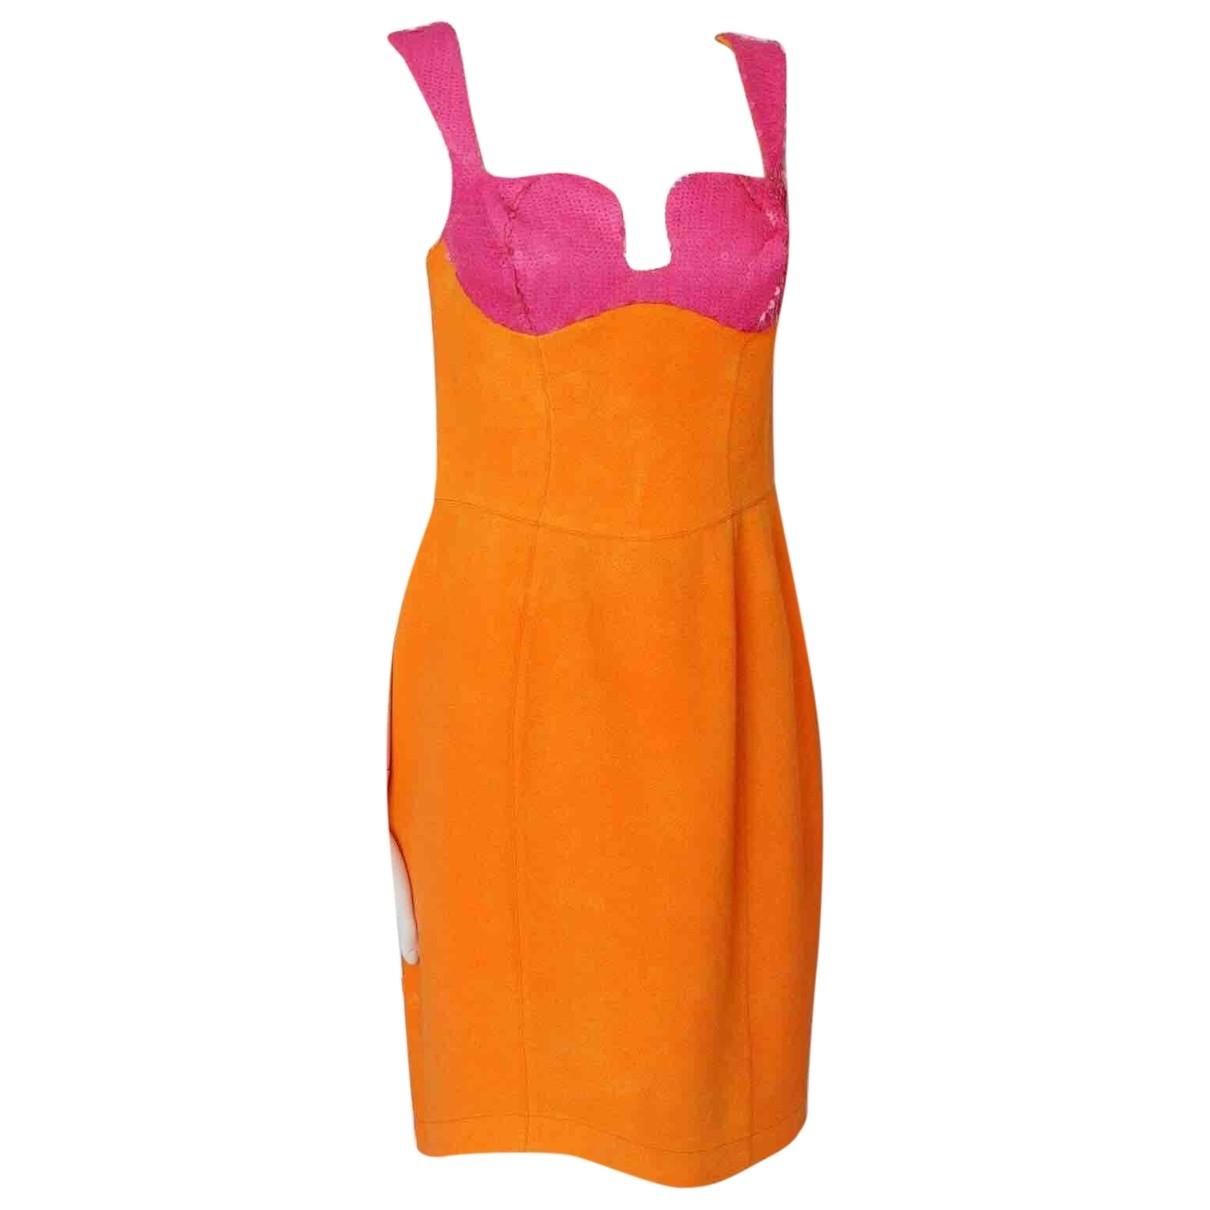 Thierry Mugler \N Orange dress for Women 38 FR